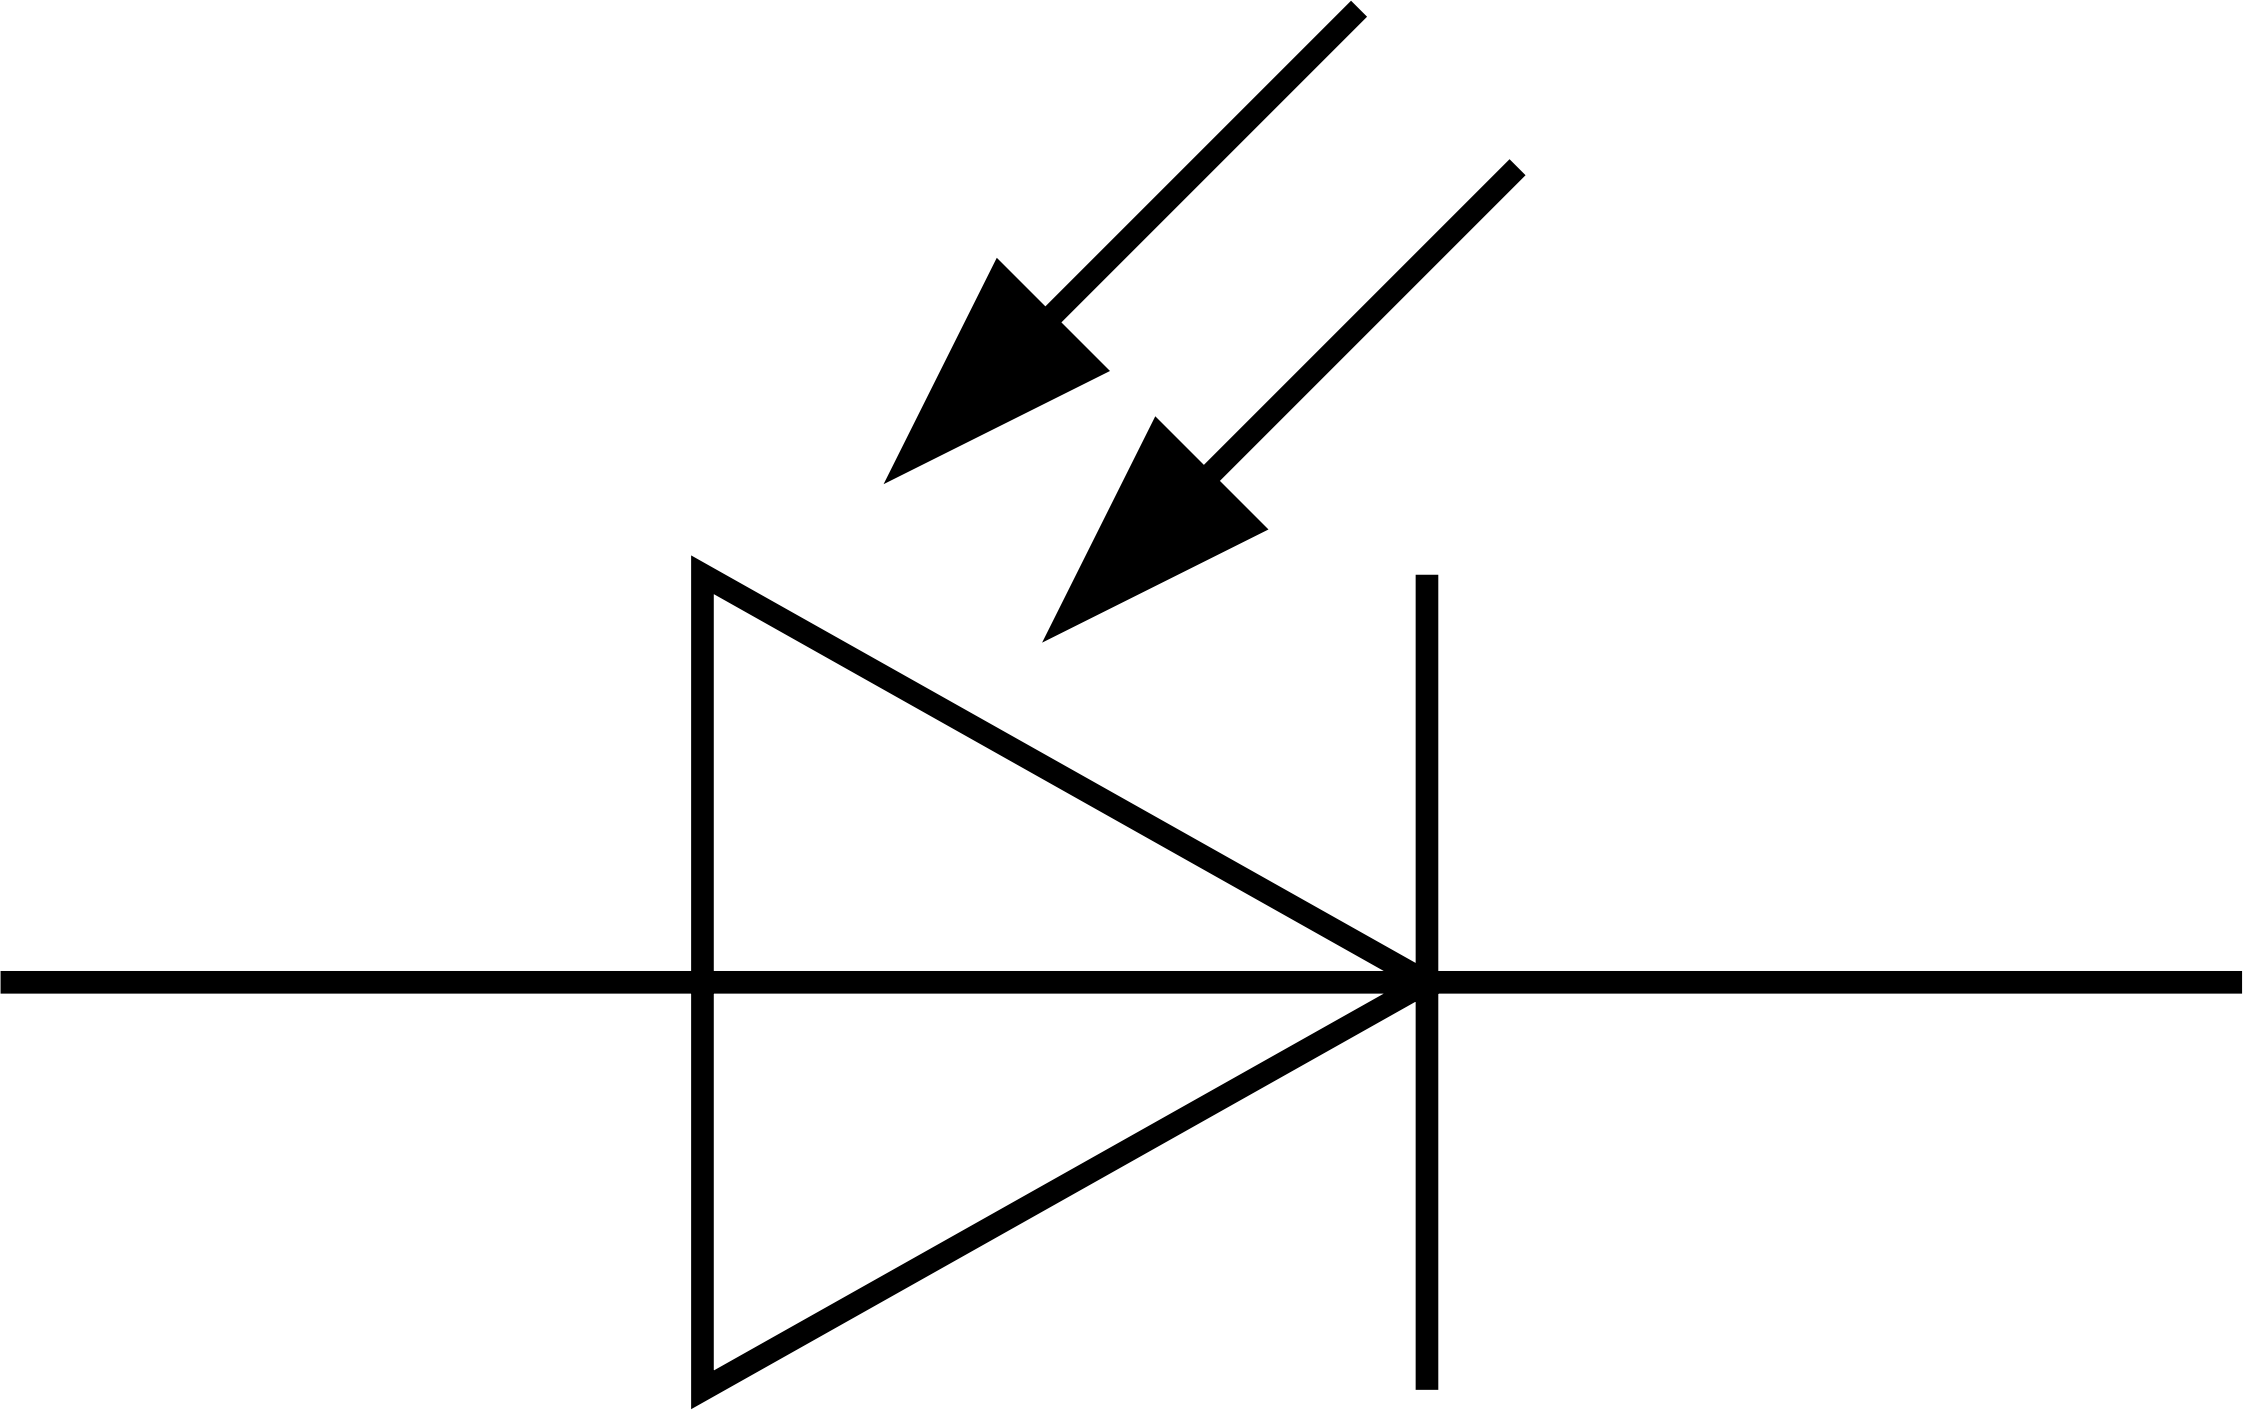 symbol of zener diode clipart best